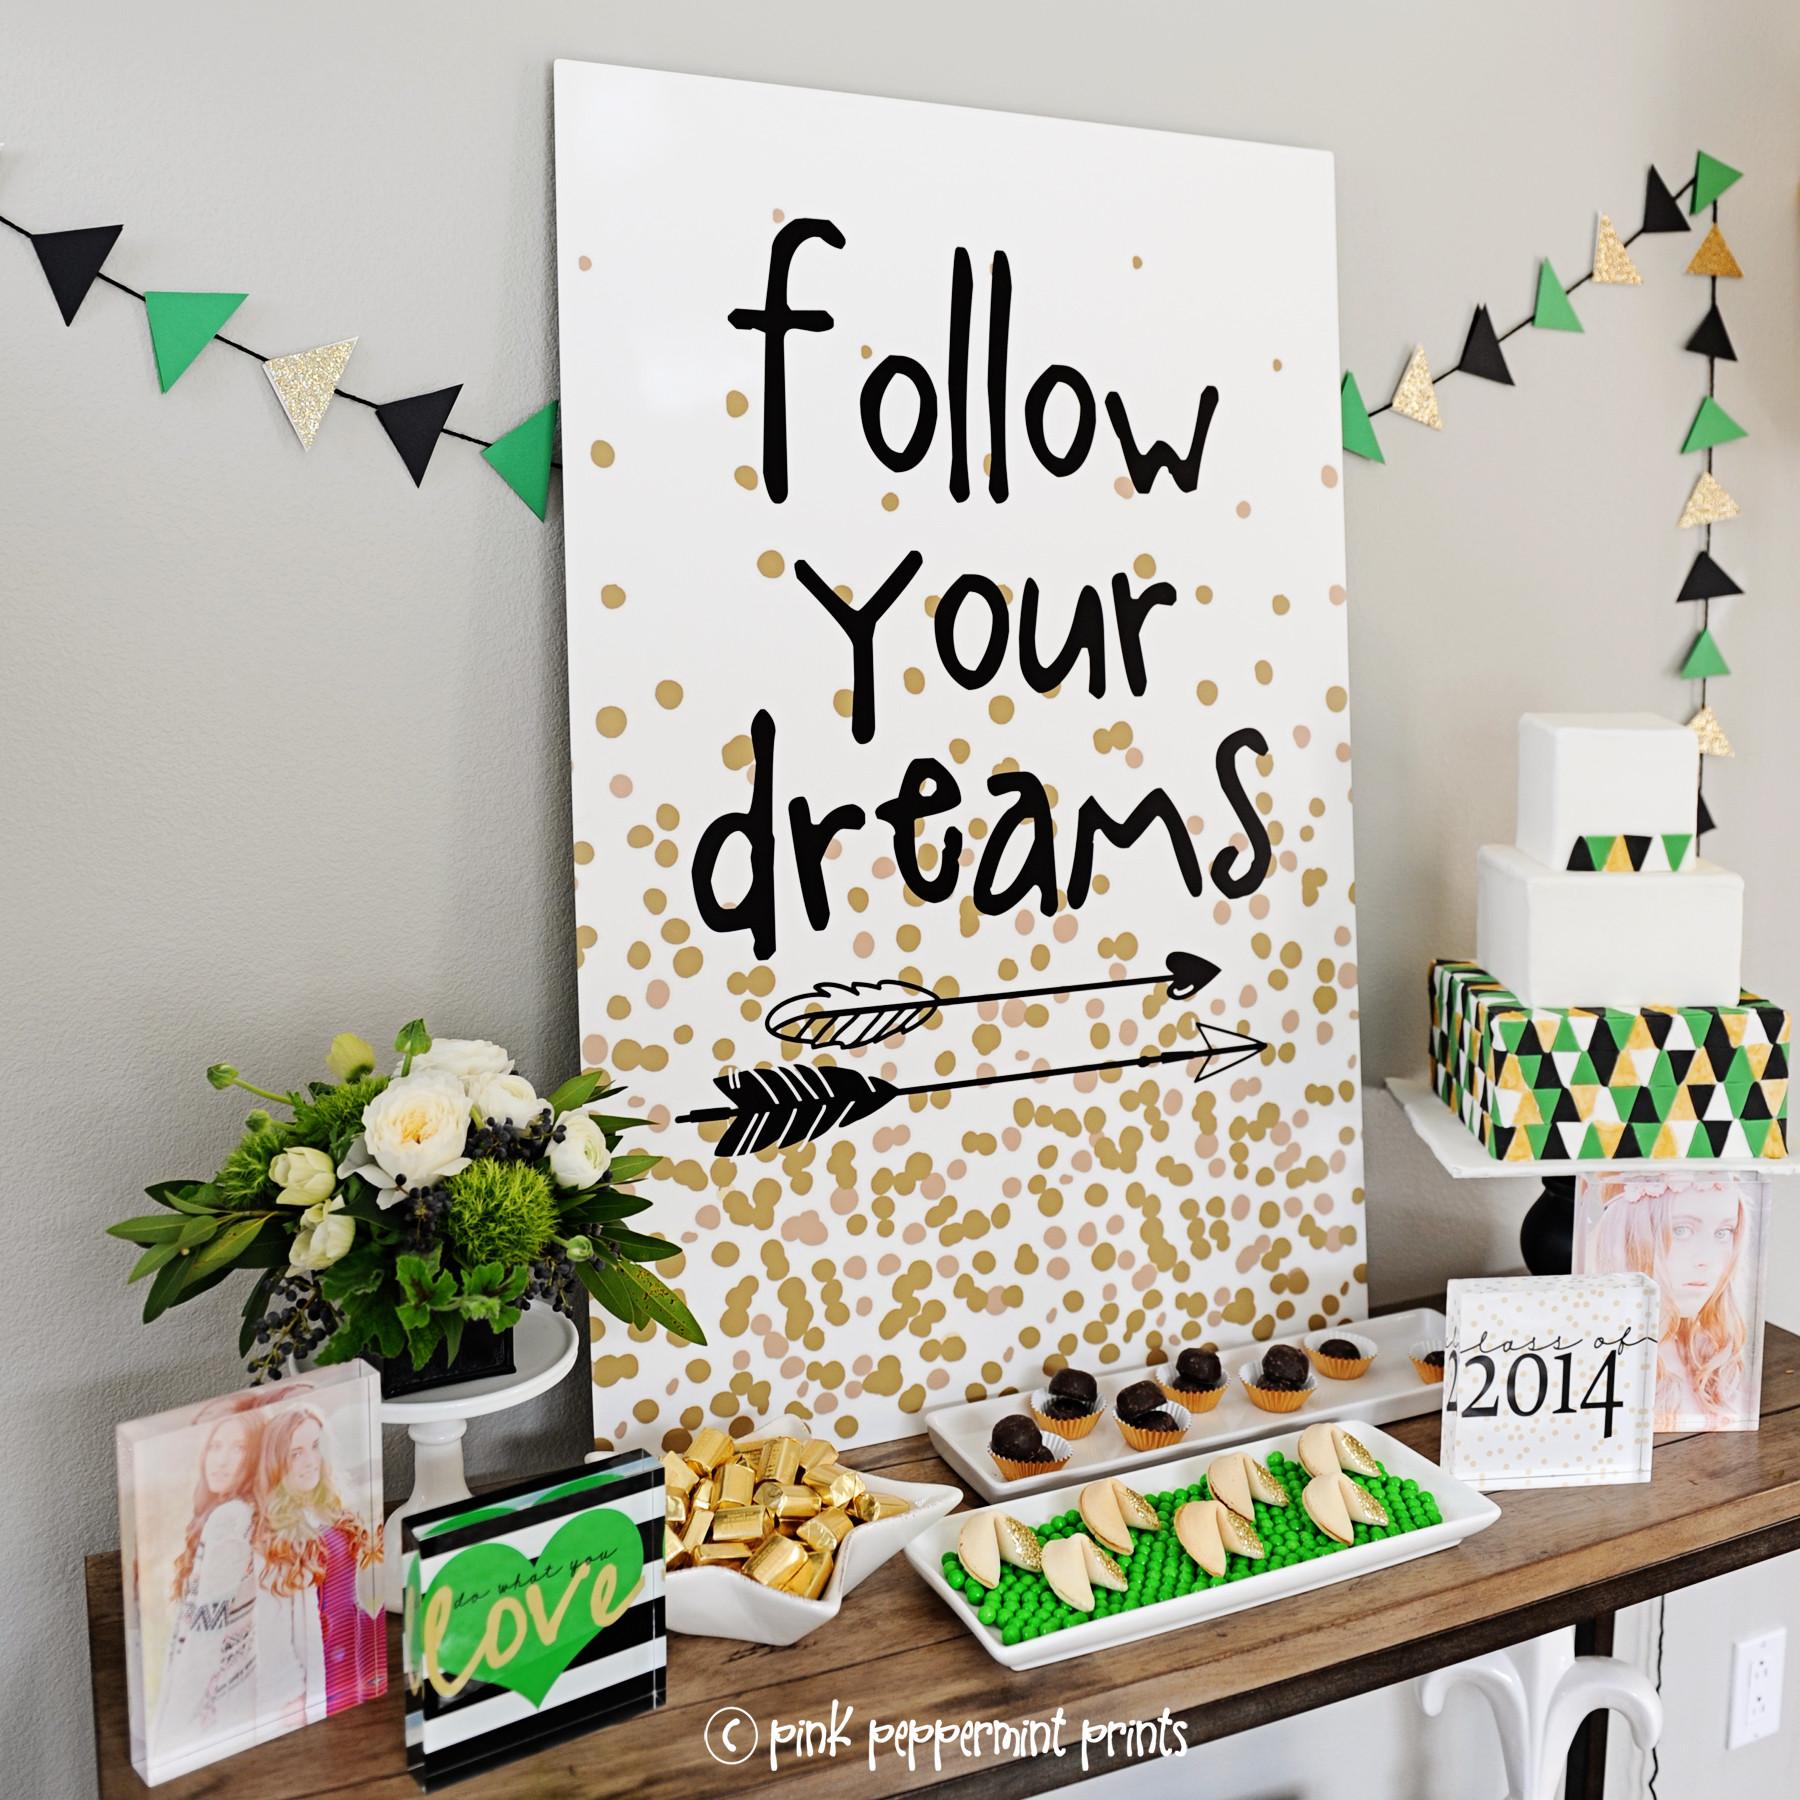 High School Graduation Party Ideas  FUN High School Graduation Party Ideas & Decorations